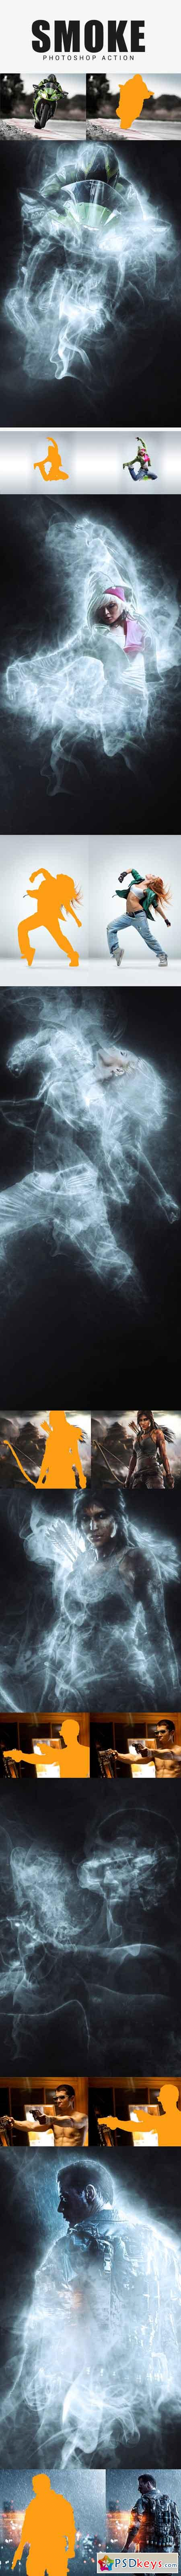 Smoke Photoshop Action 17530990